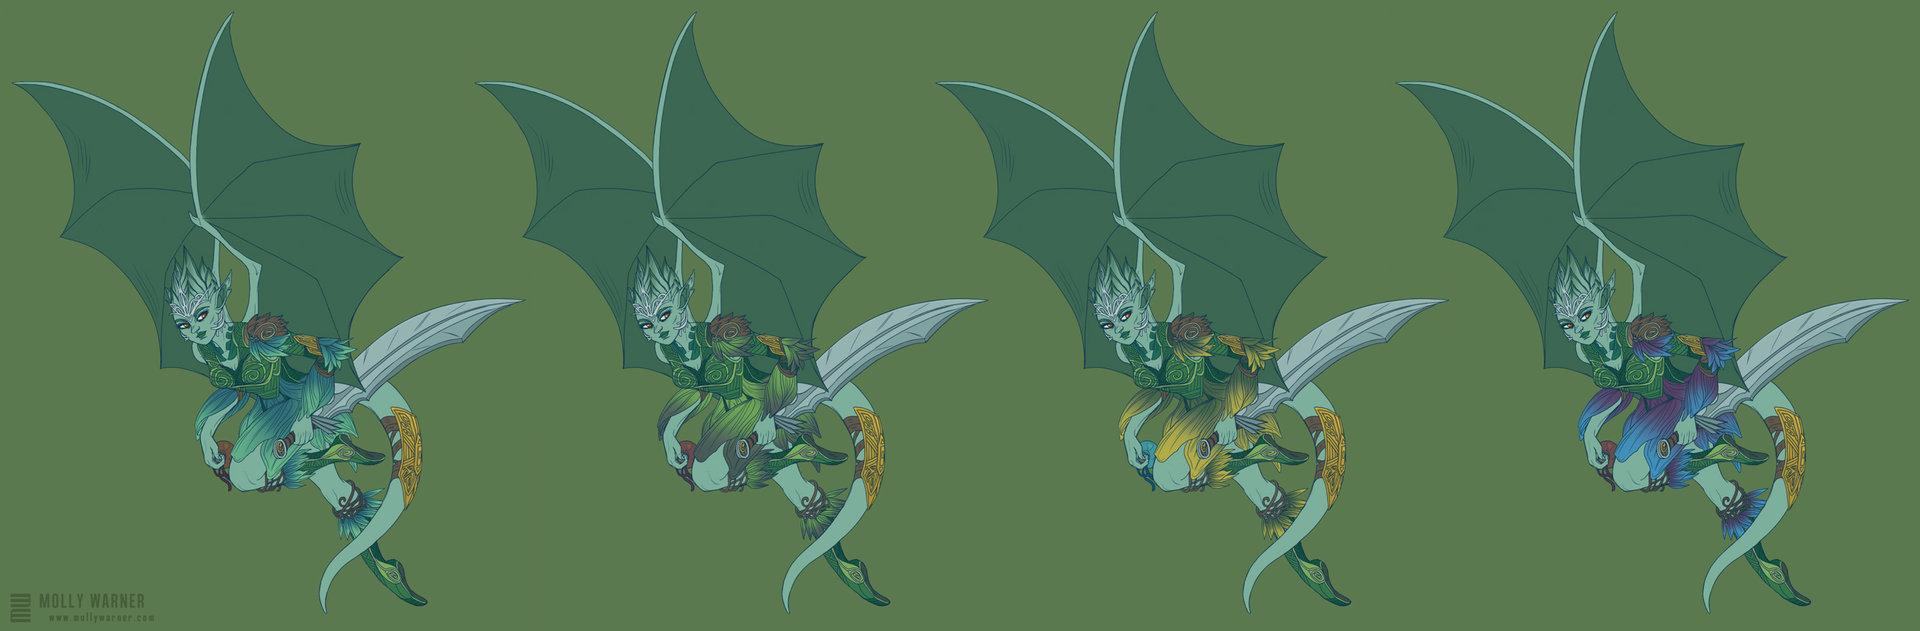 Molly warner caedrin half dragon comparisons